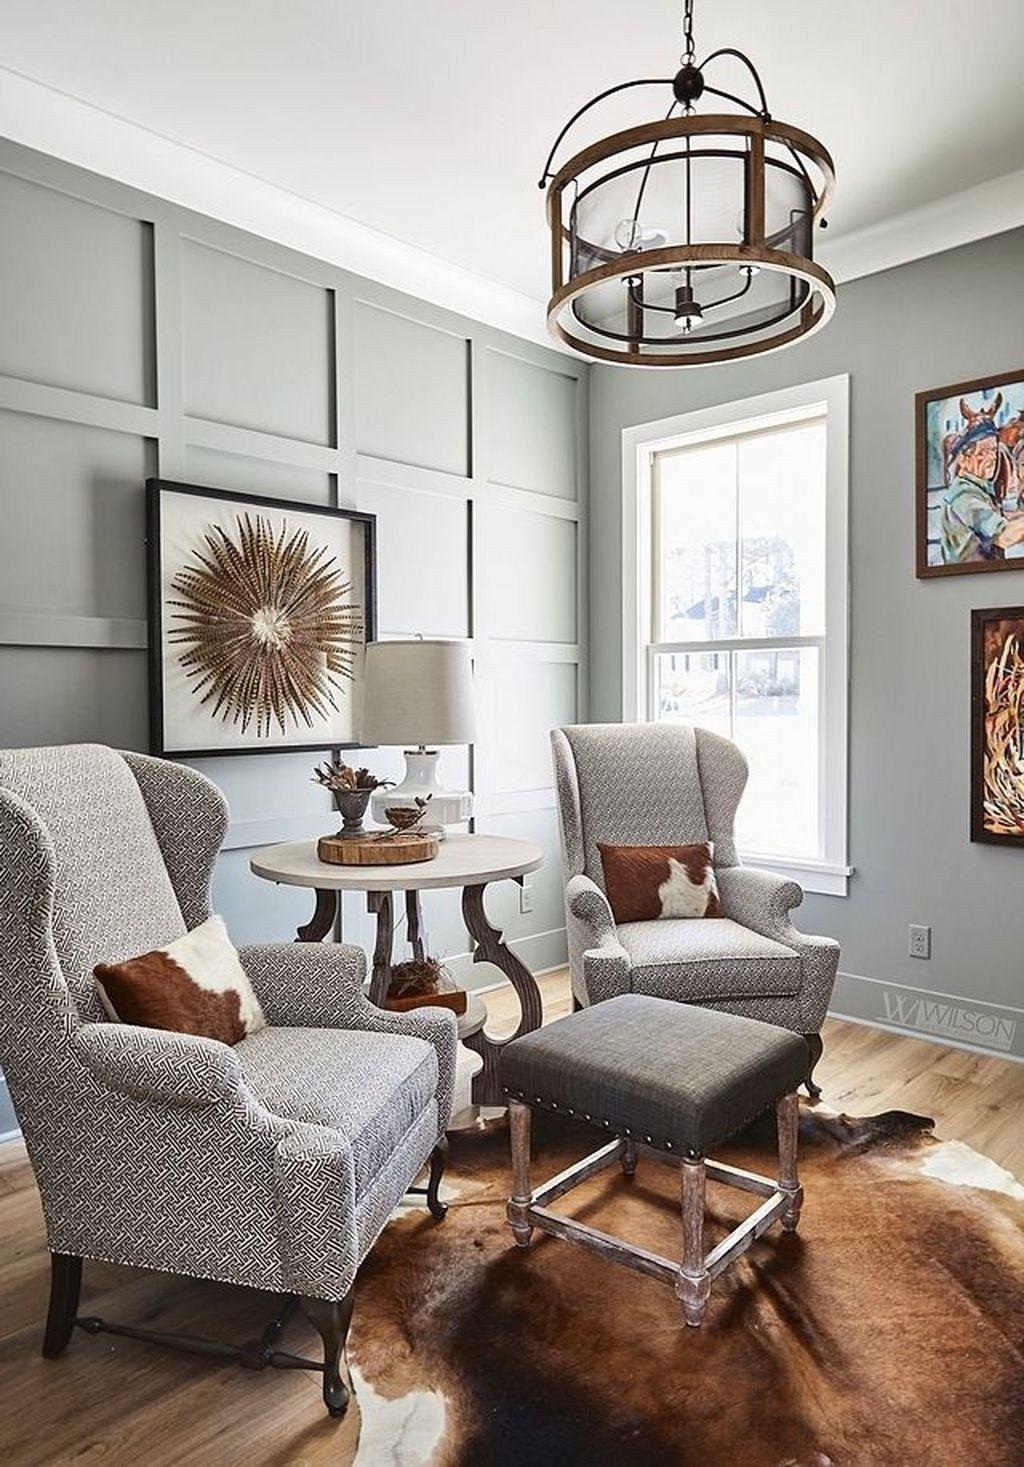 42 Popular Interior Design Ideas With Farmhouse Style